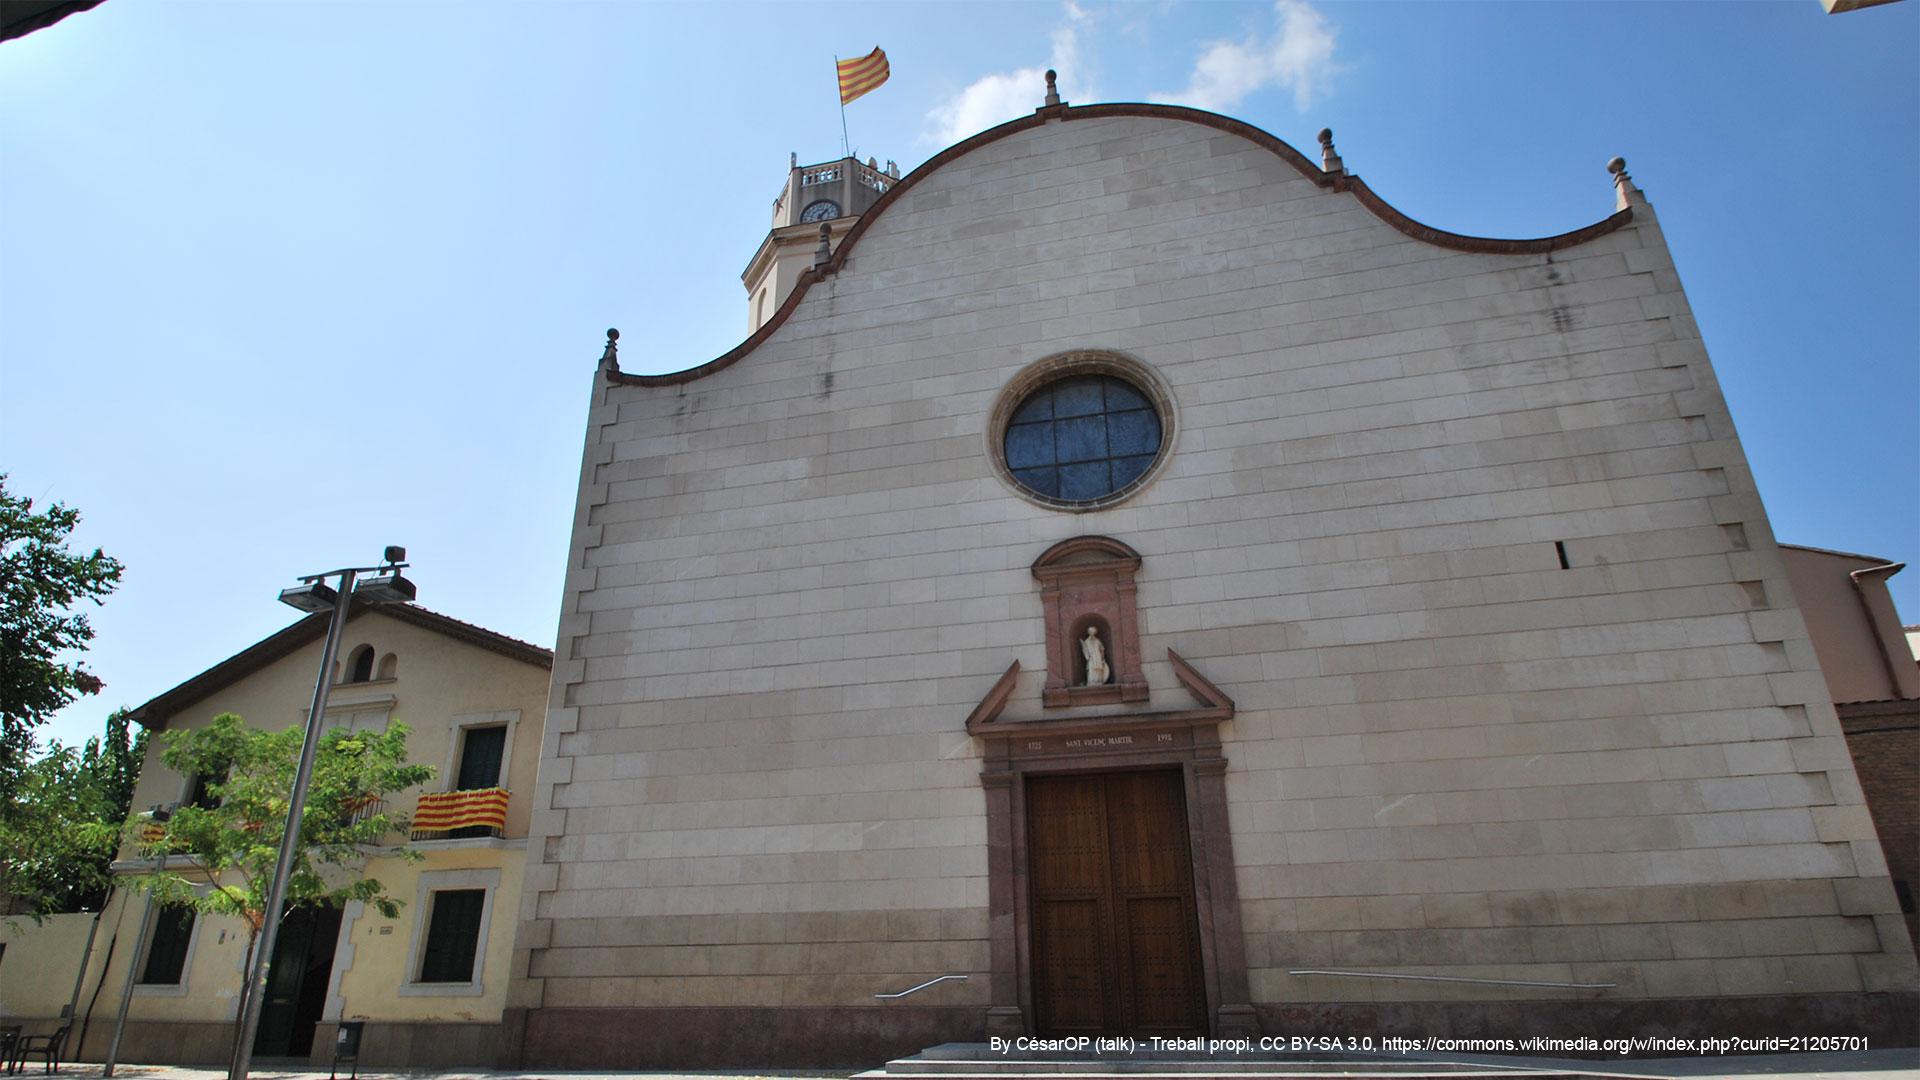 Mudanzas en Sant Vicenç dels Horts